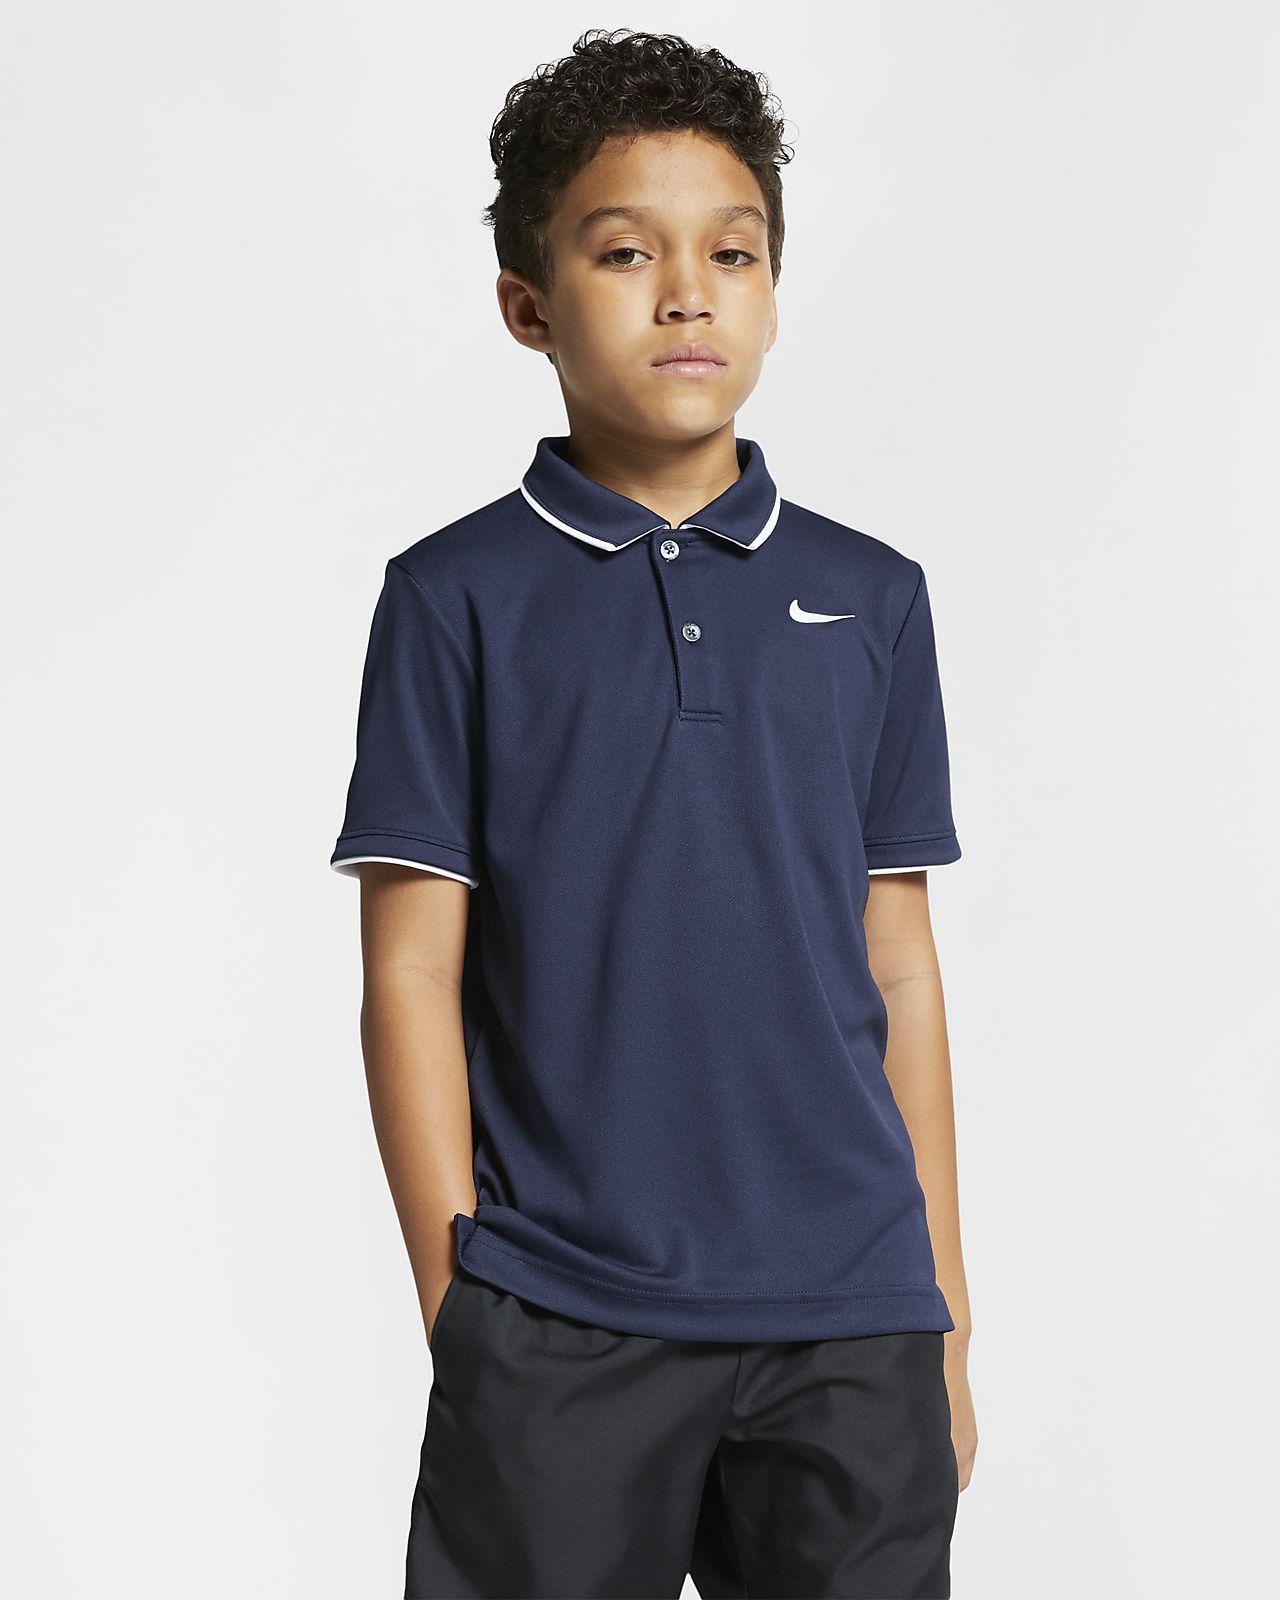 Tennispikétröja NikeCourt Dri-FIT för ungdom (killar)